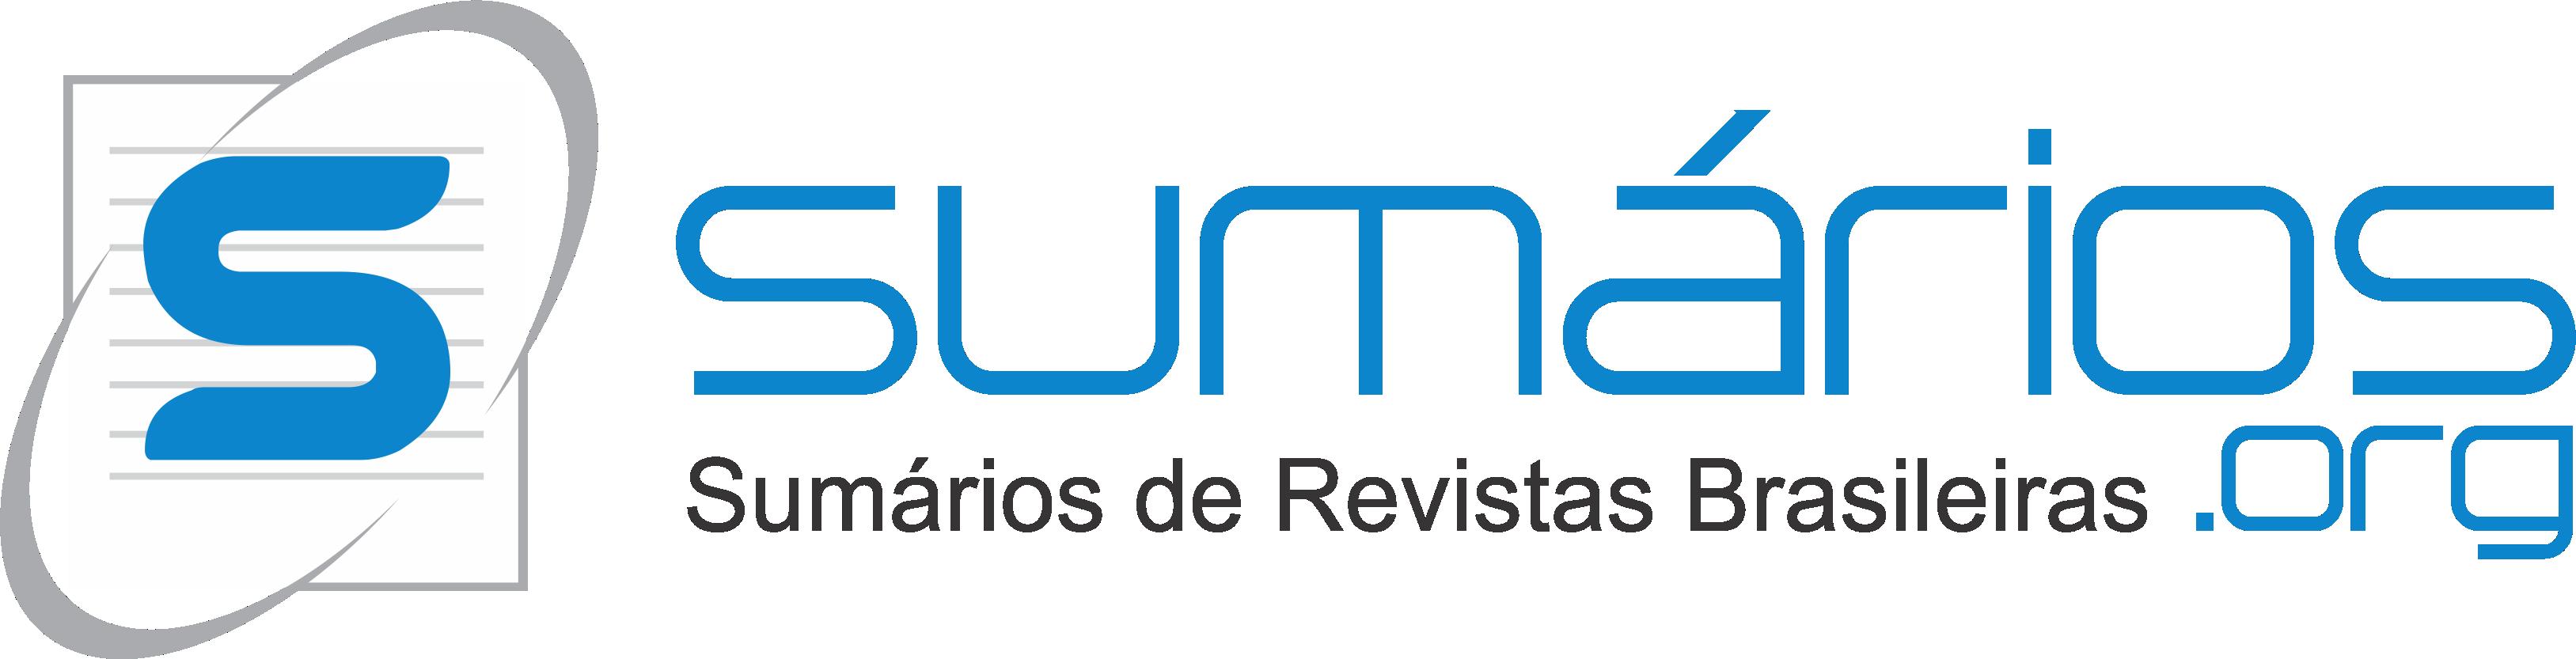 logotipo sumários.png